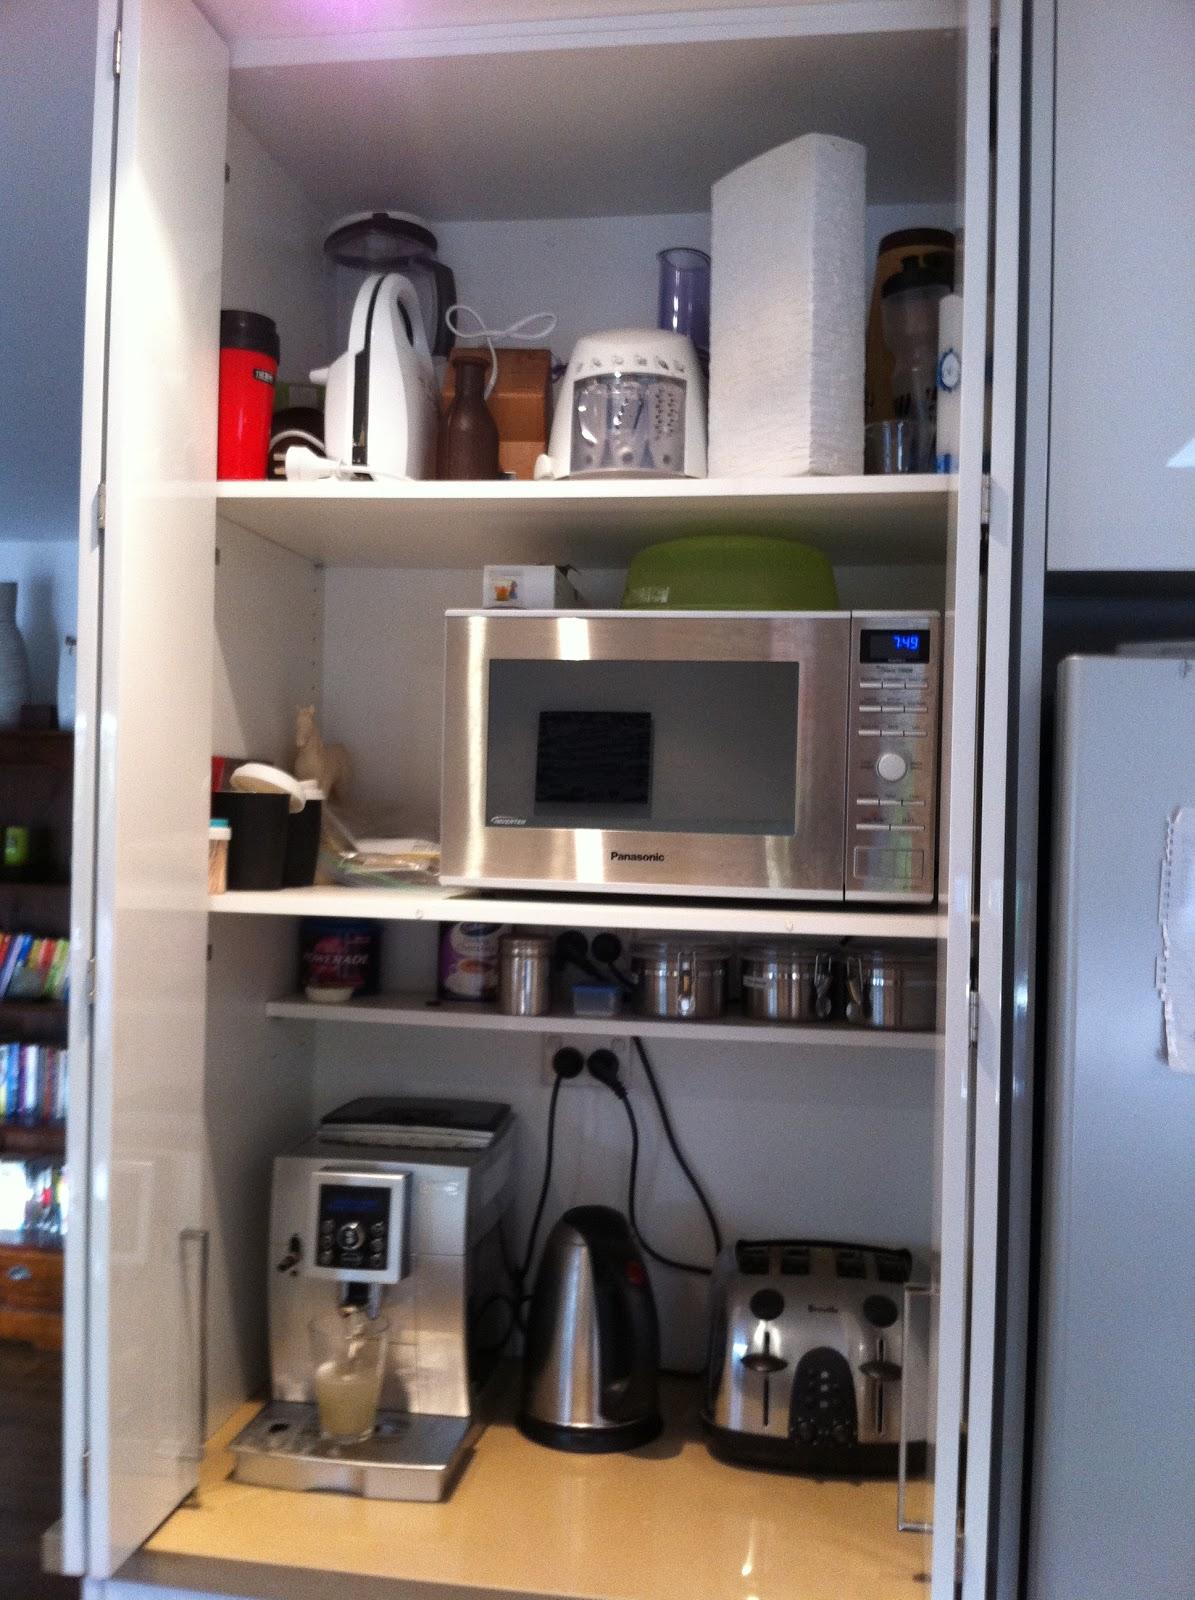 Organising To Make Life Easier: Kitchen Cupboards ...